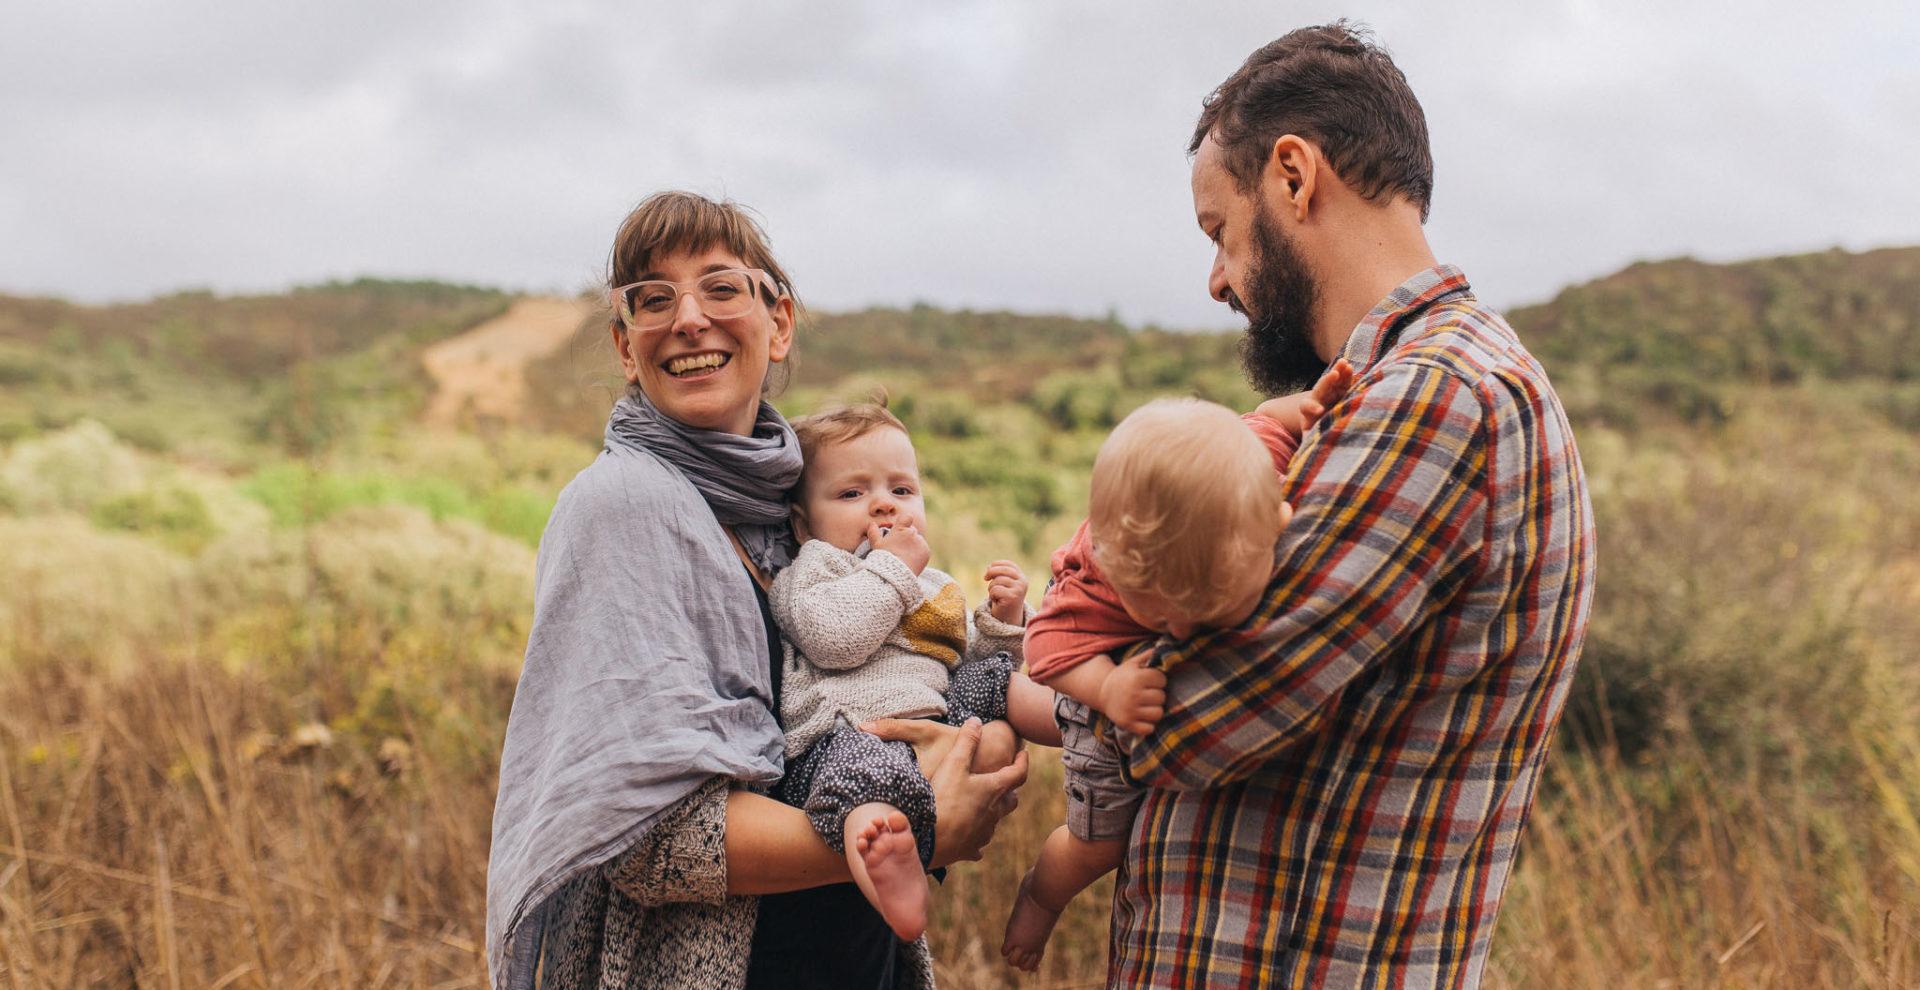 Familienfotograf Stuttgart-professionelle Familien reportage im urlaub-zwillingsbabies-algarveurlaub mit kind